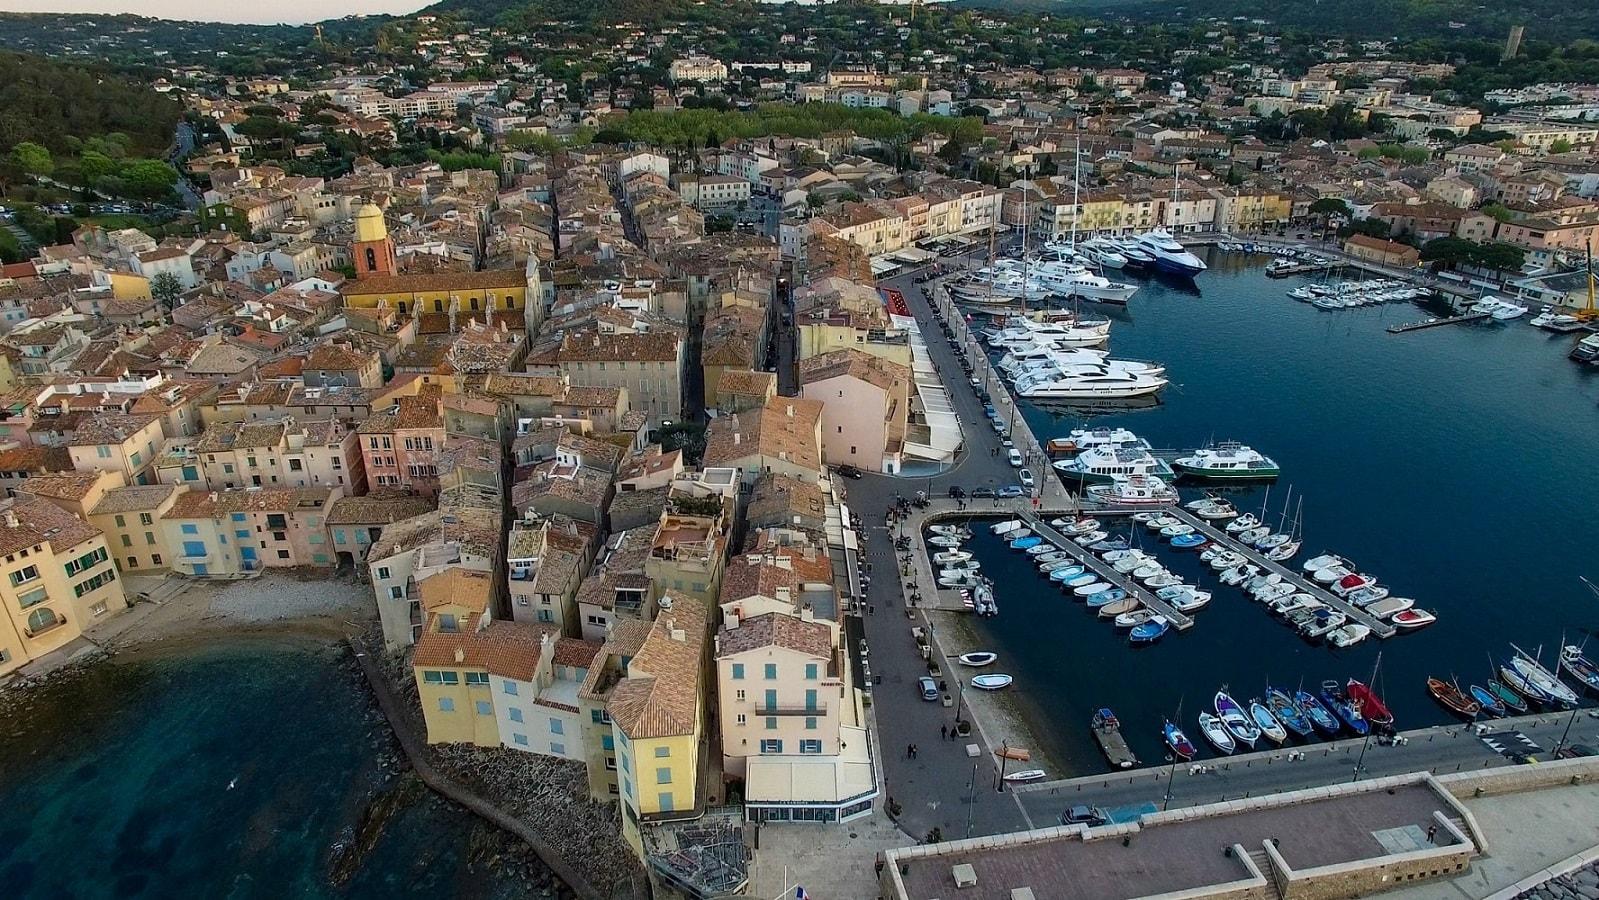 Chauffeur privé VTC Saint-Tropez var Nicemediterranée toulonhyeres marseillemarignane-min